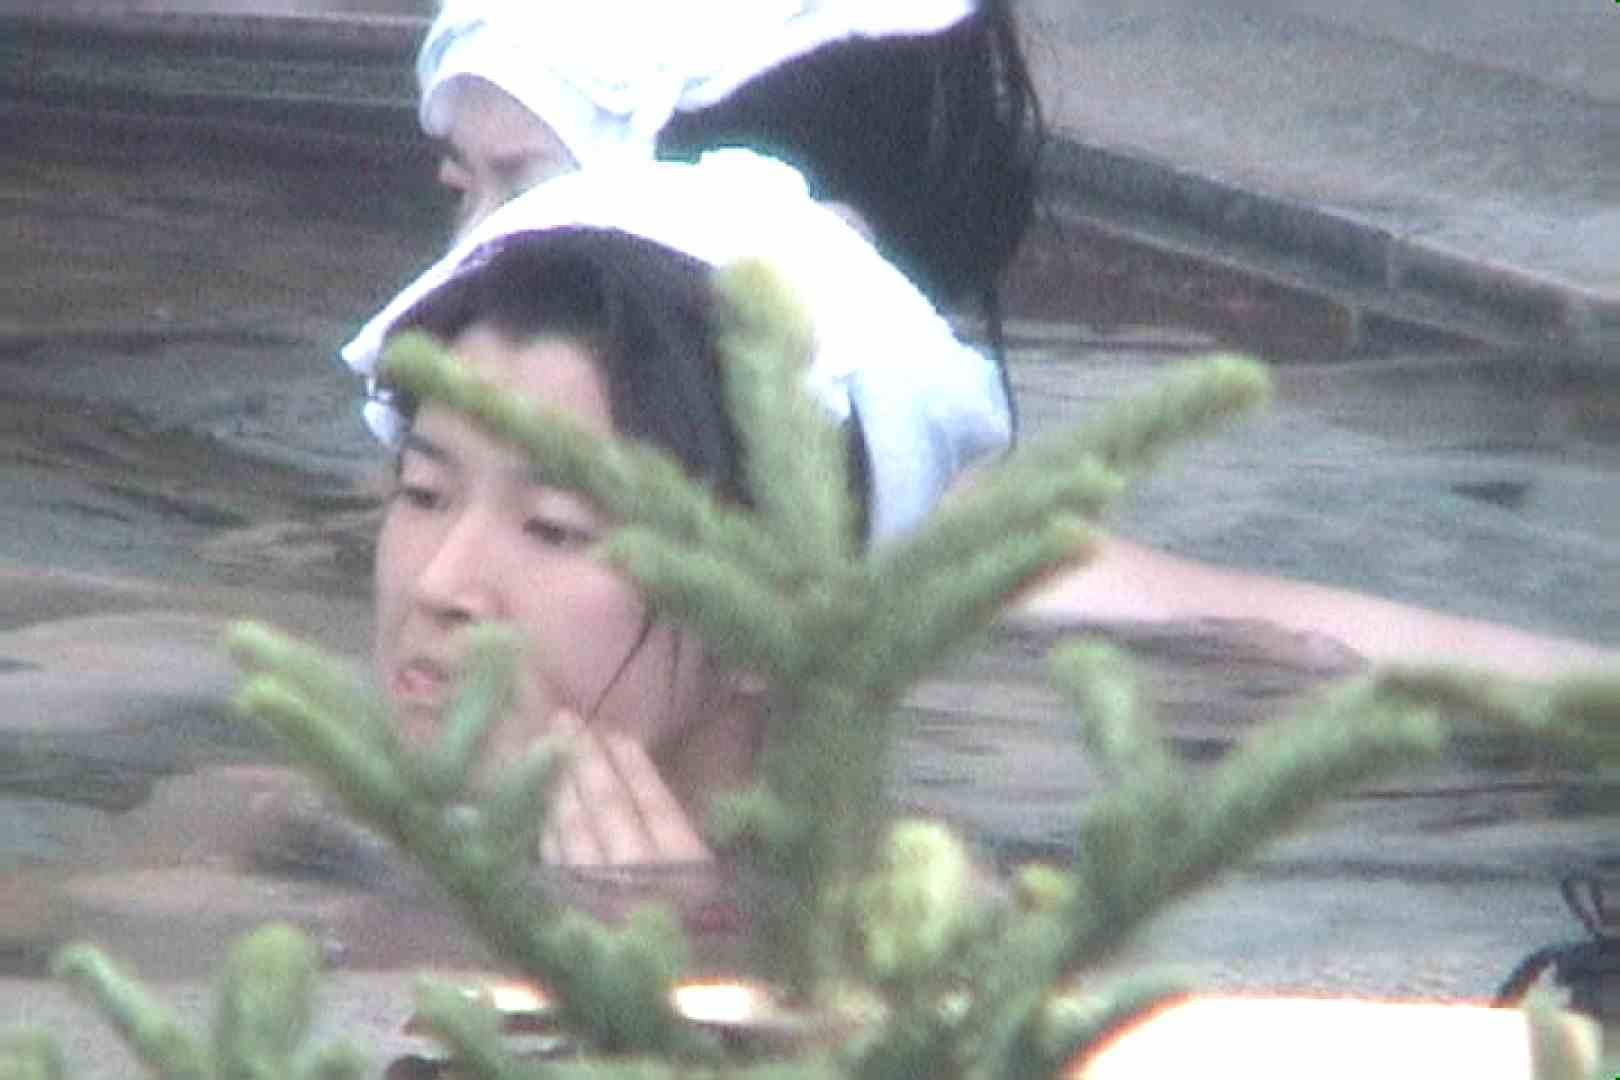 Aquaな露天風呂Vol.80【VIP限定】 0  73連発 70